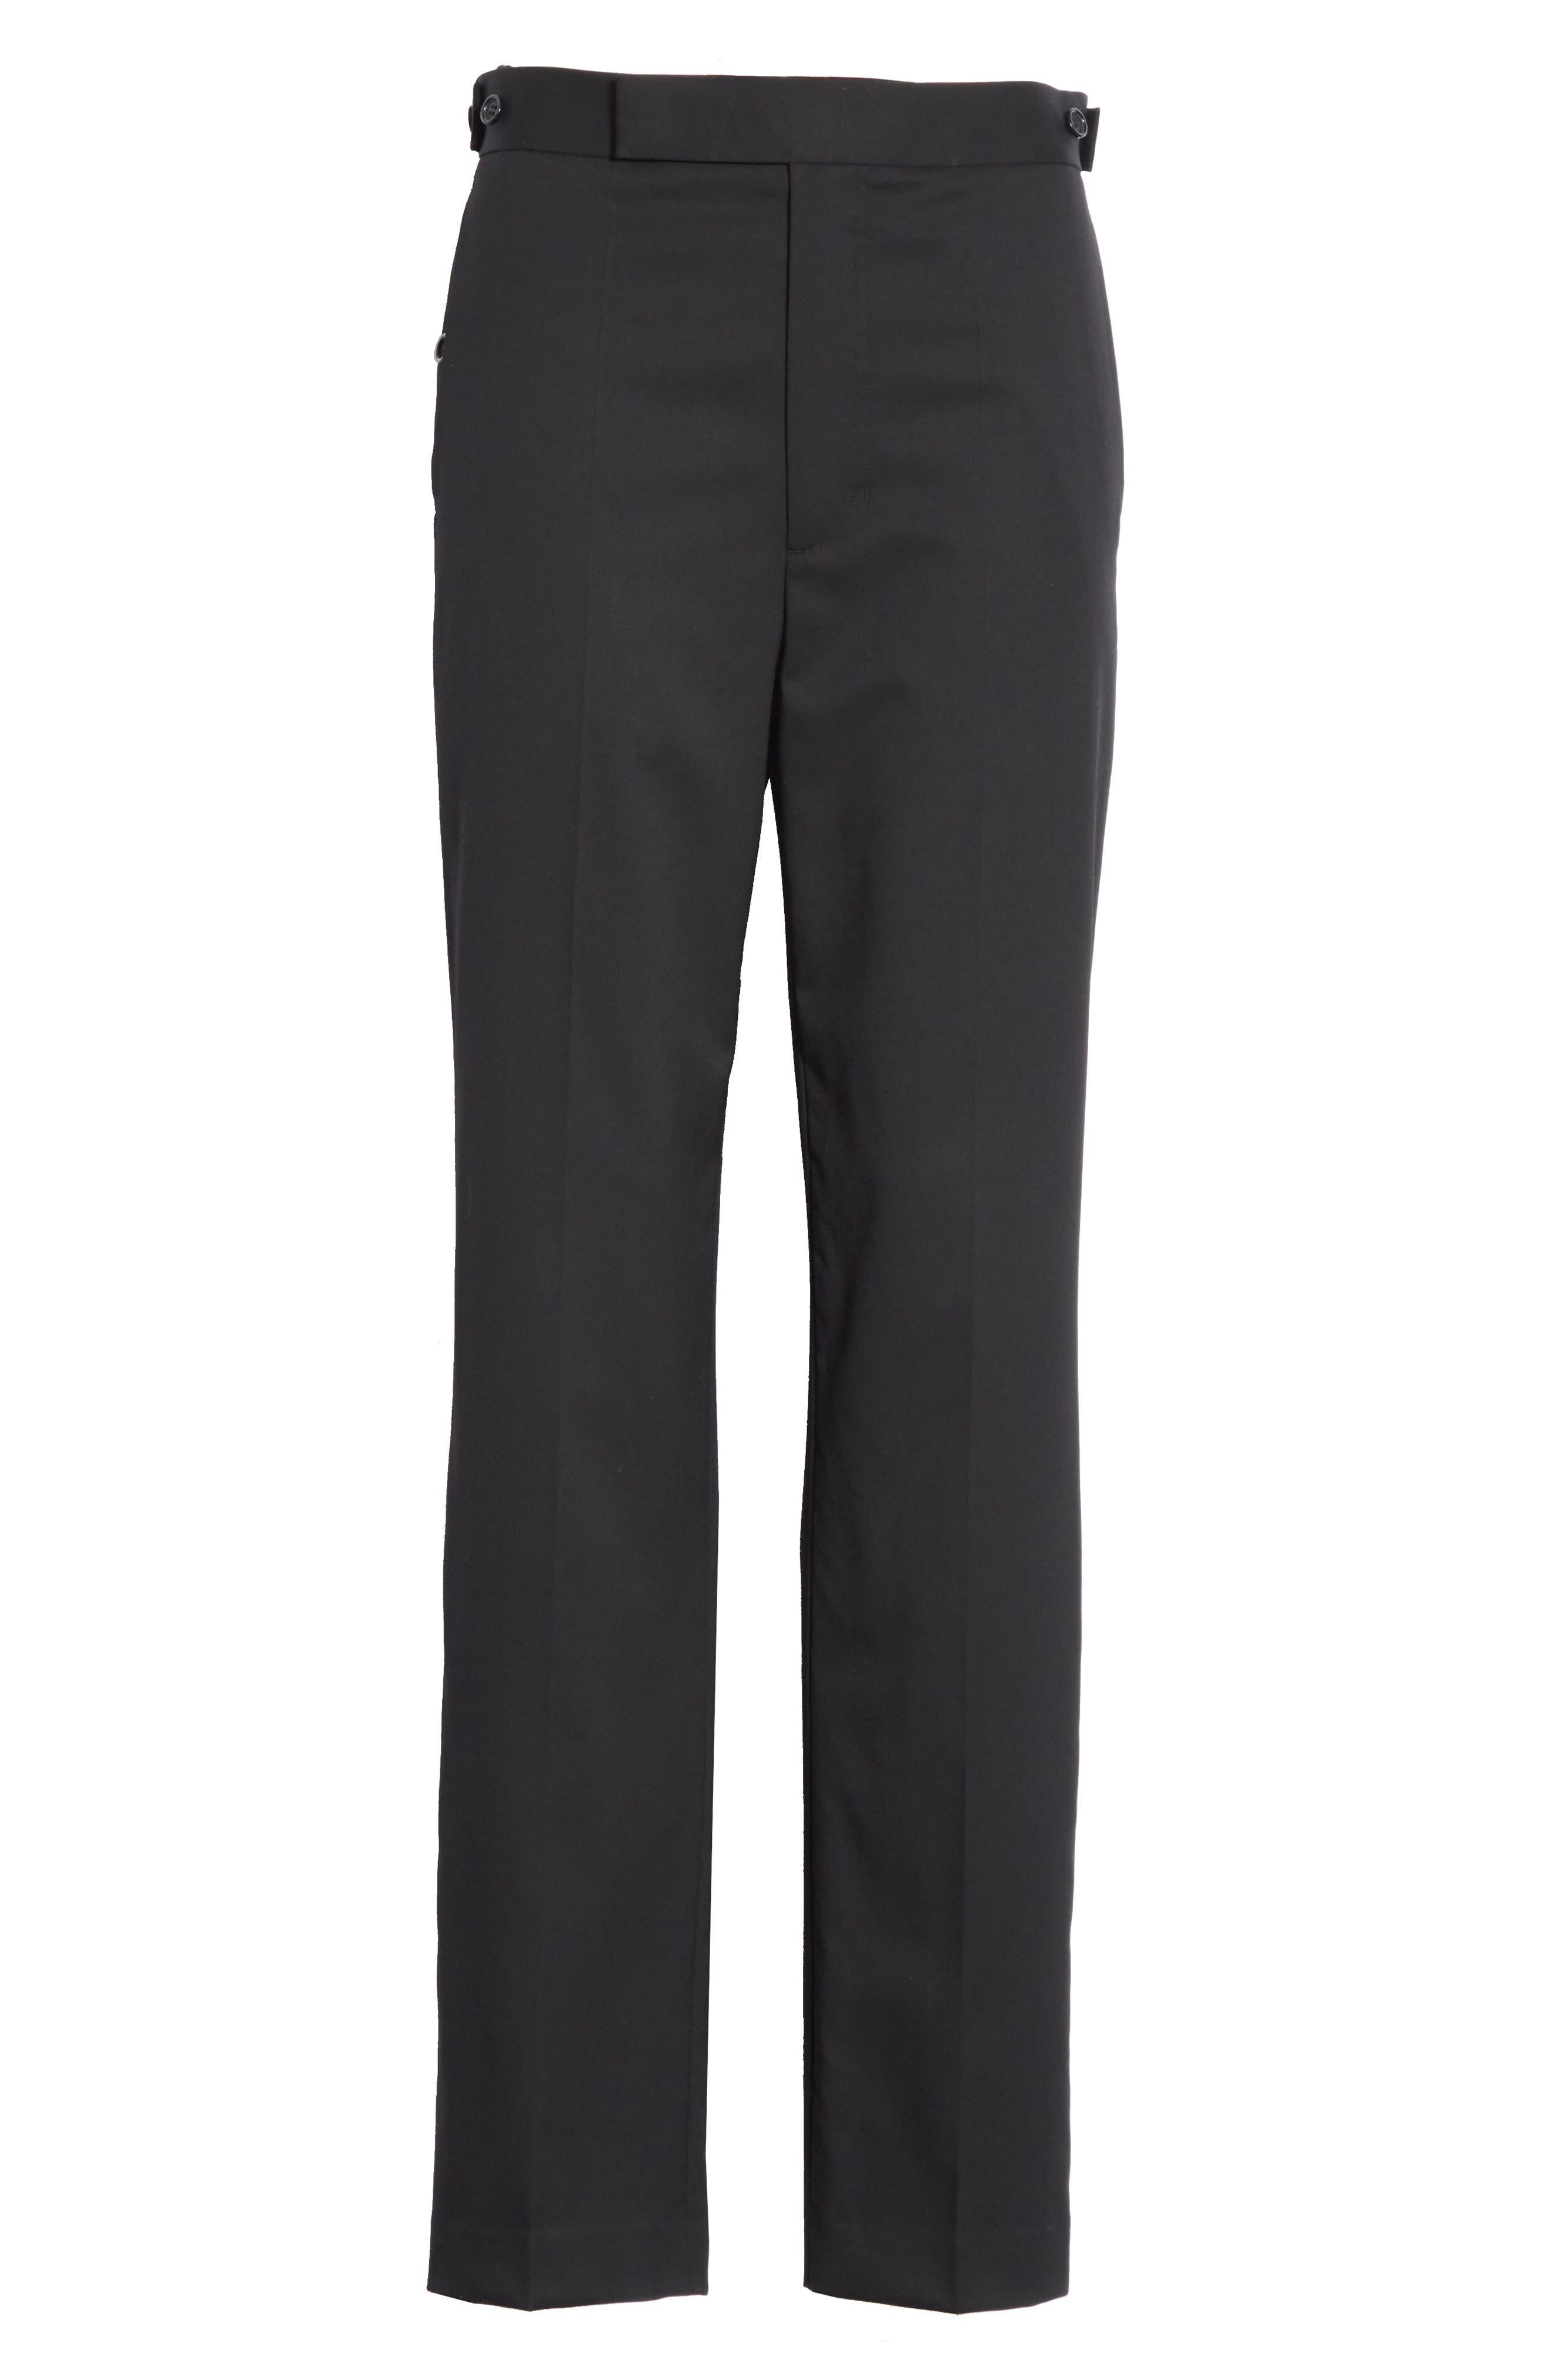 Straight Leg Wool Trousers,                             Alternate thumbnail 6, color,                             001